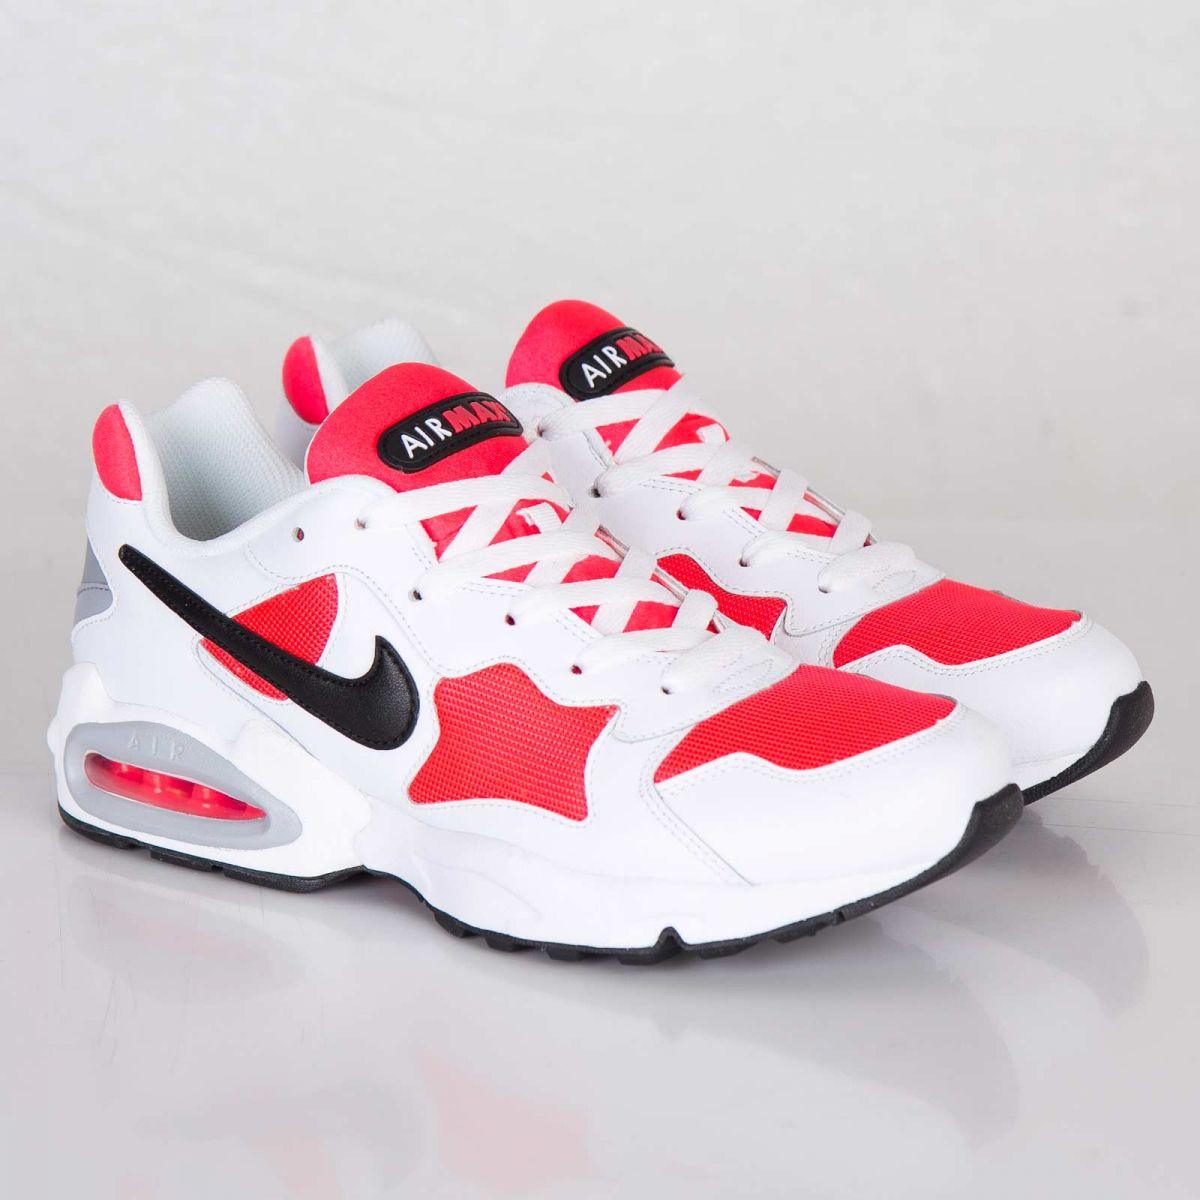 '94 Retro Laser Max Air Crimson Nike Weartesters Triax 2IWHeEDY9